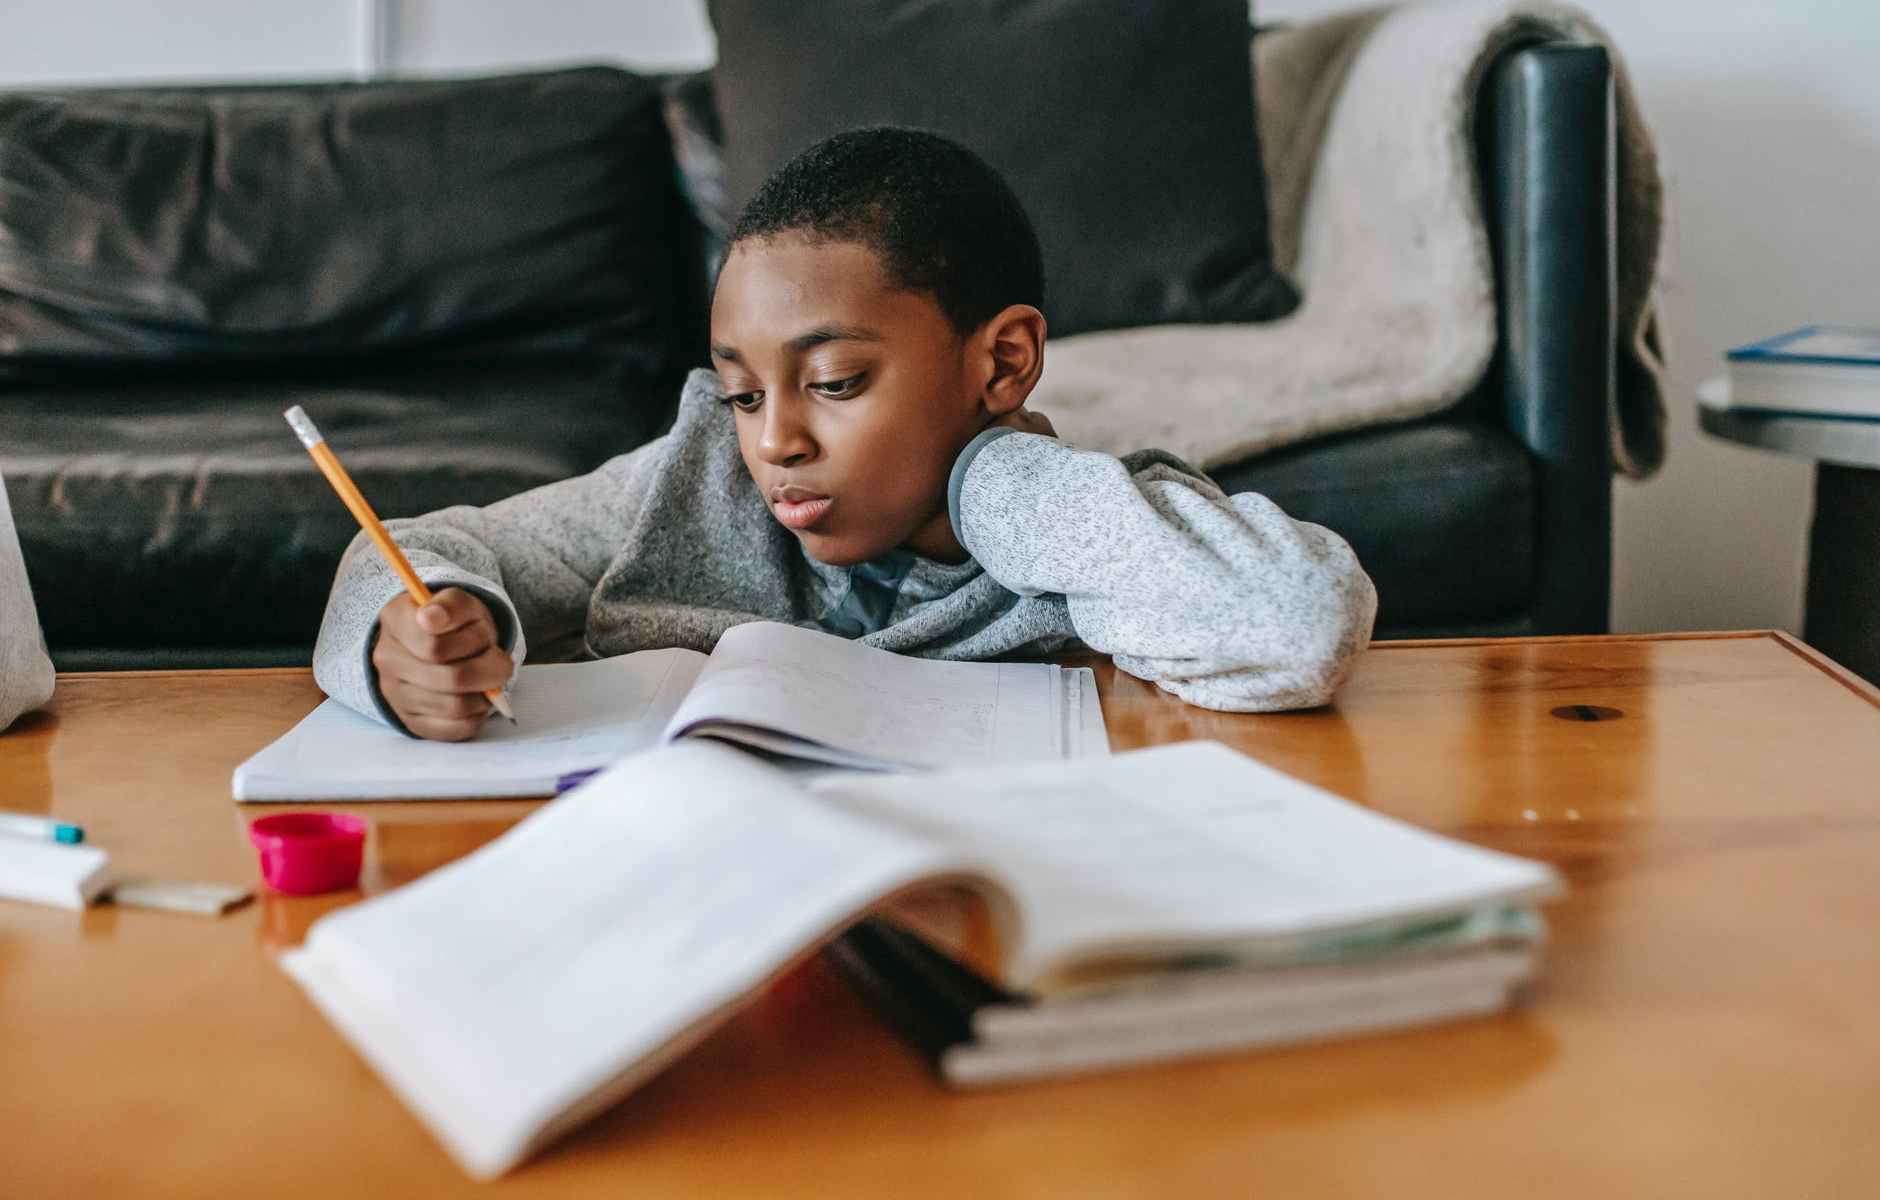 frustrated black kid with grey sweatshirt doing homework